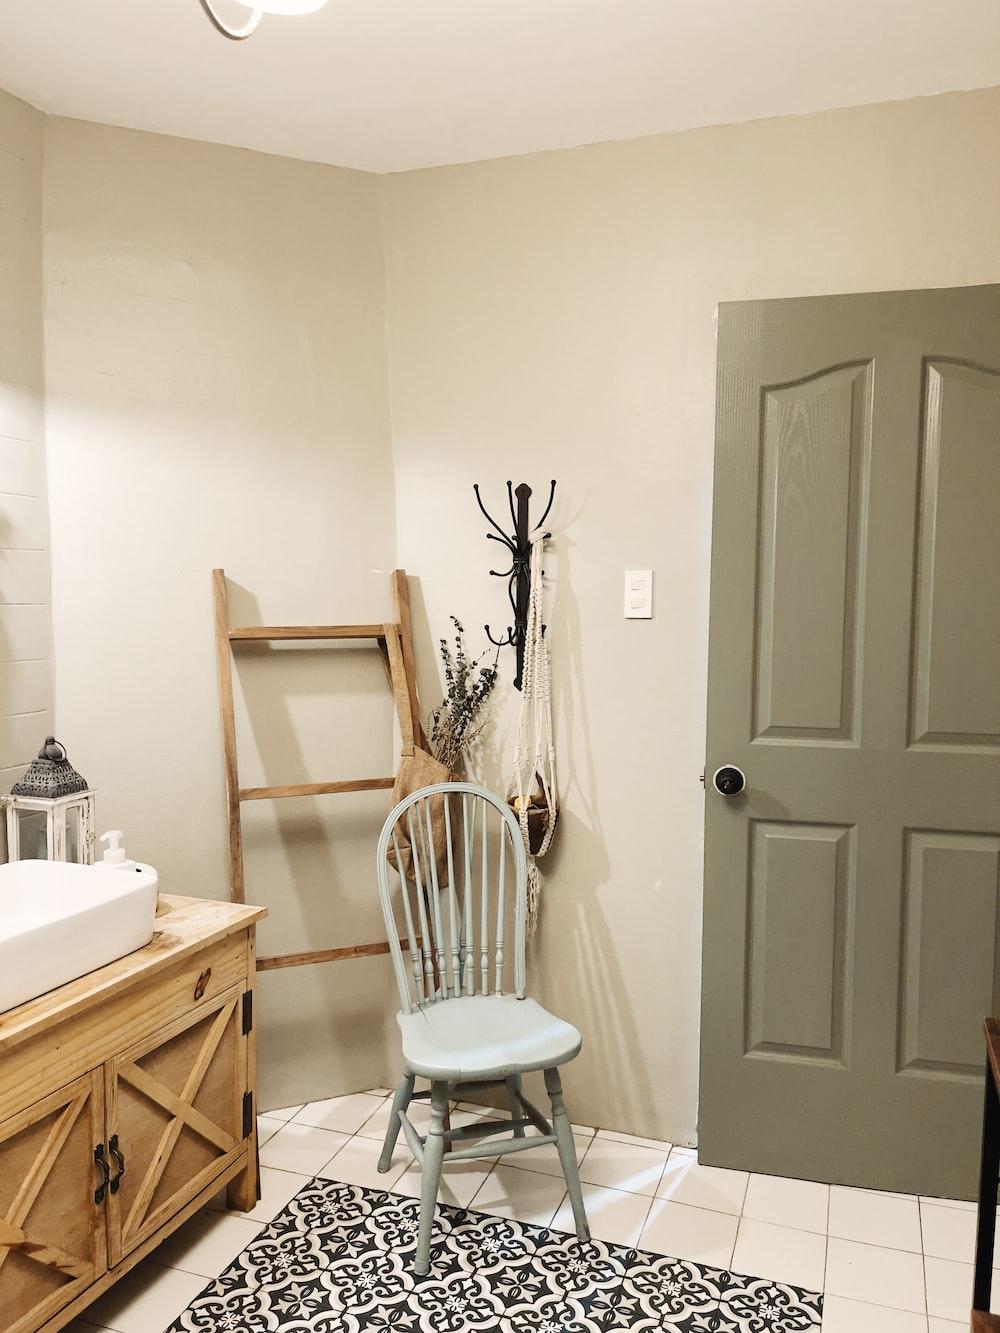 white wooden door beside white ceramic sink